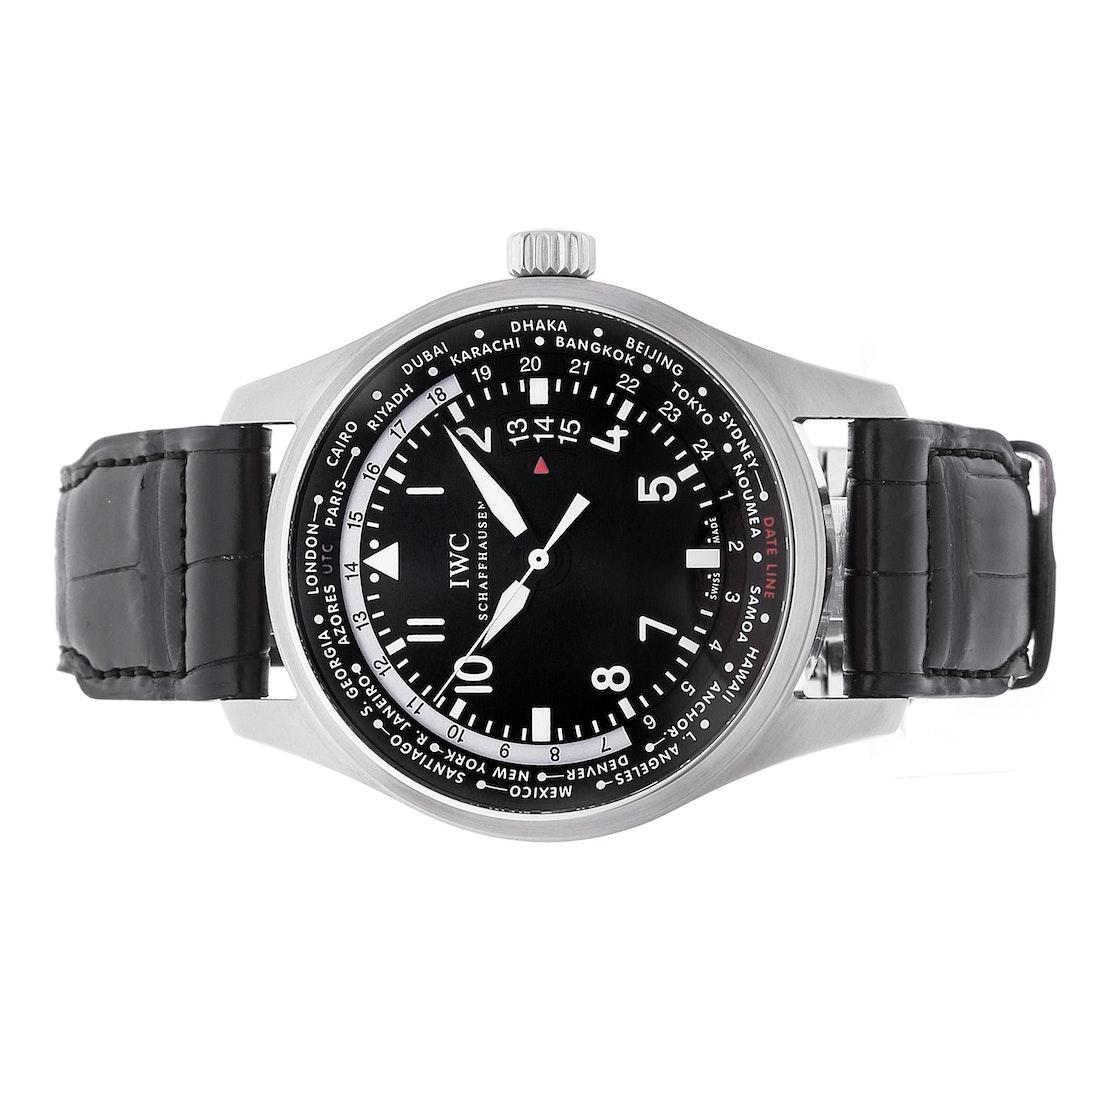 IWC Pilot's Watch Worldtimer IW3262-01